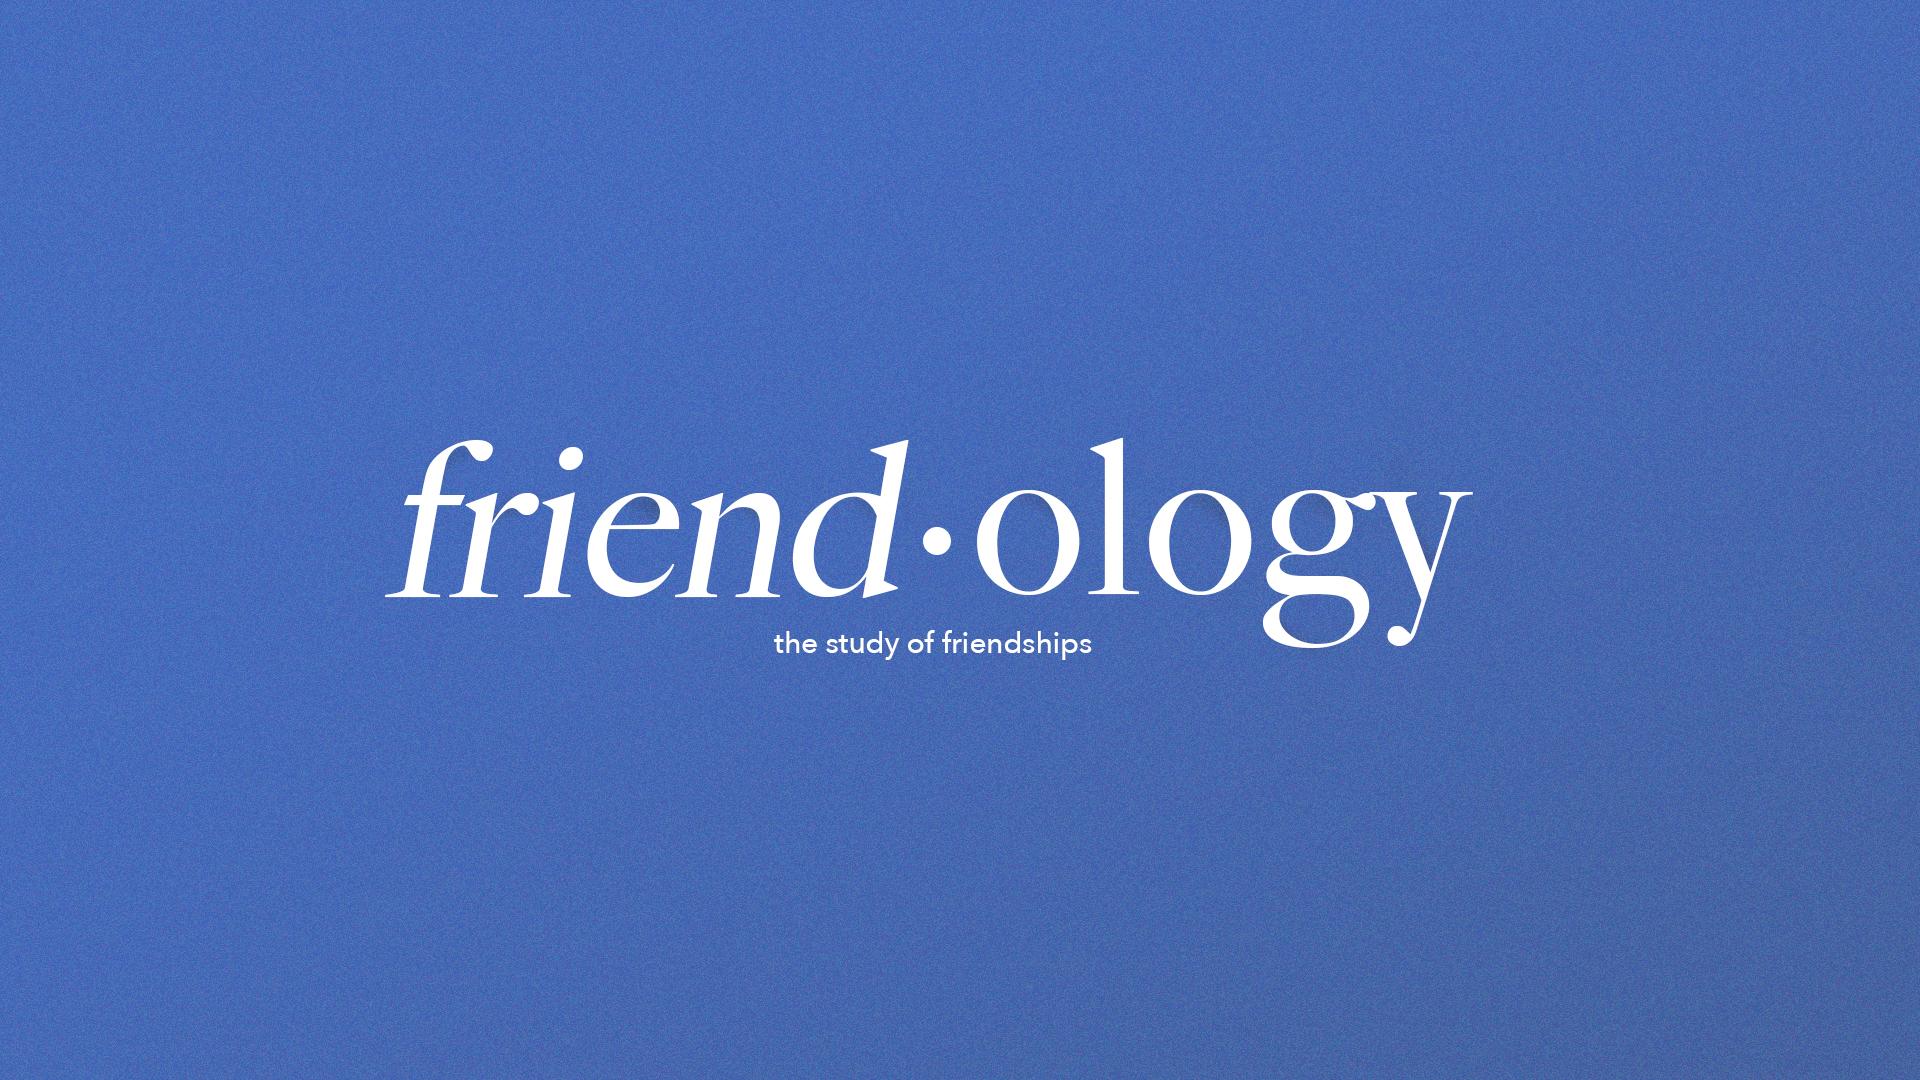 SS_Friend-ology.jpg